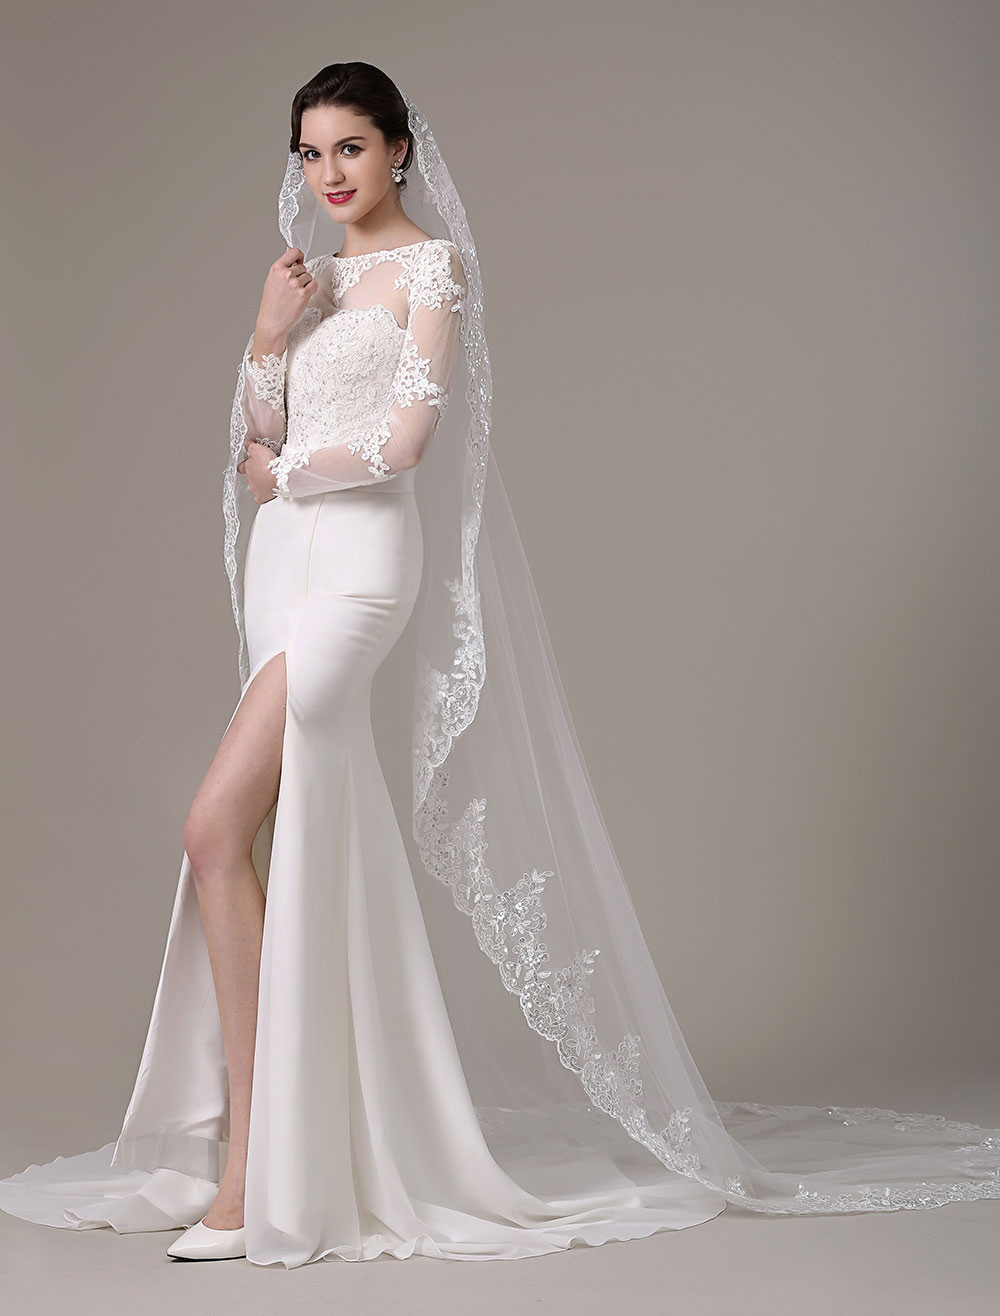 Ivory Lace Applique Edge Wedding Veils